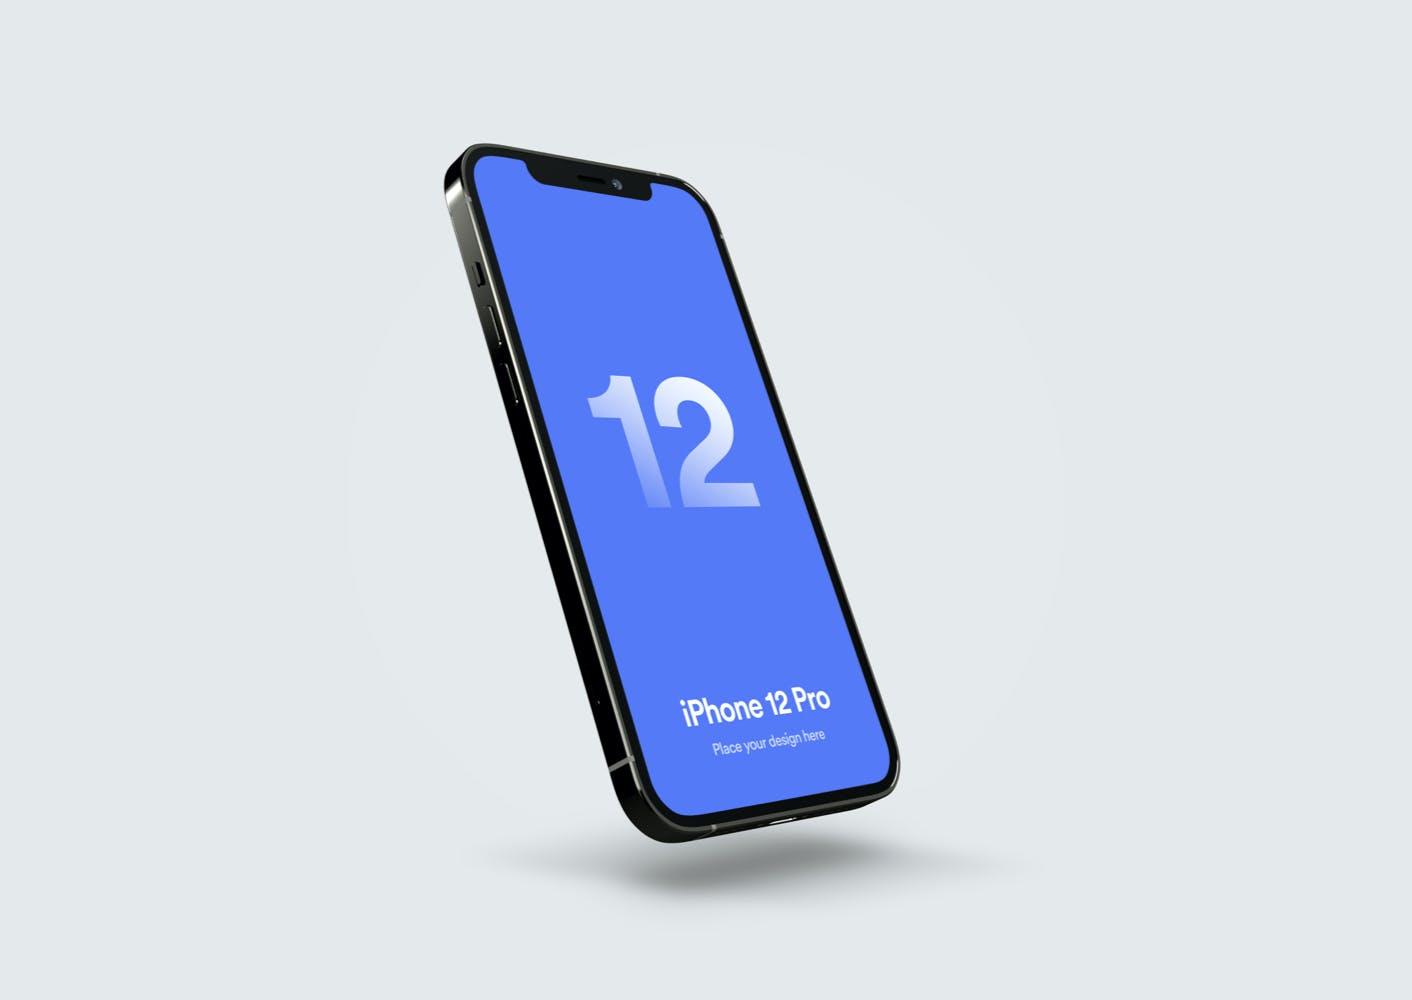 高端iPhone 12 Pro产品UI展示样机mockups Vol 02 designshidai_yj400